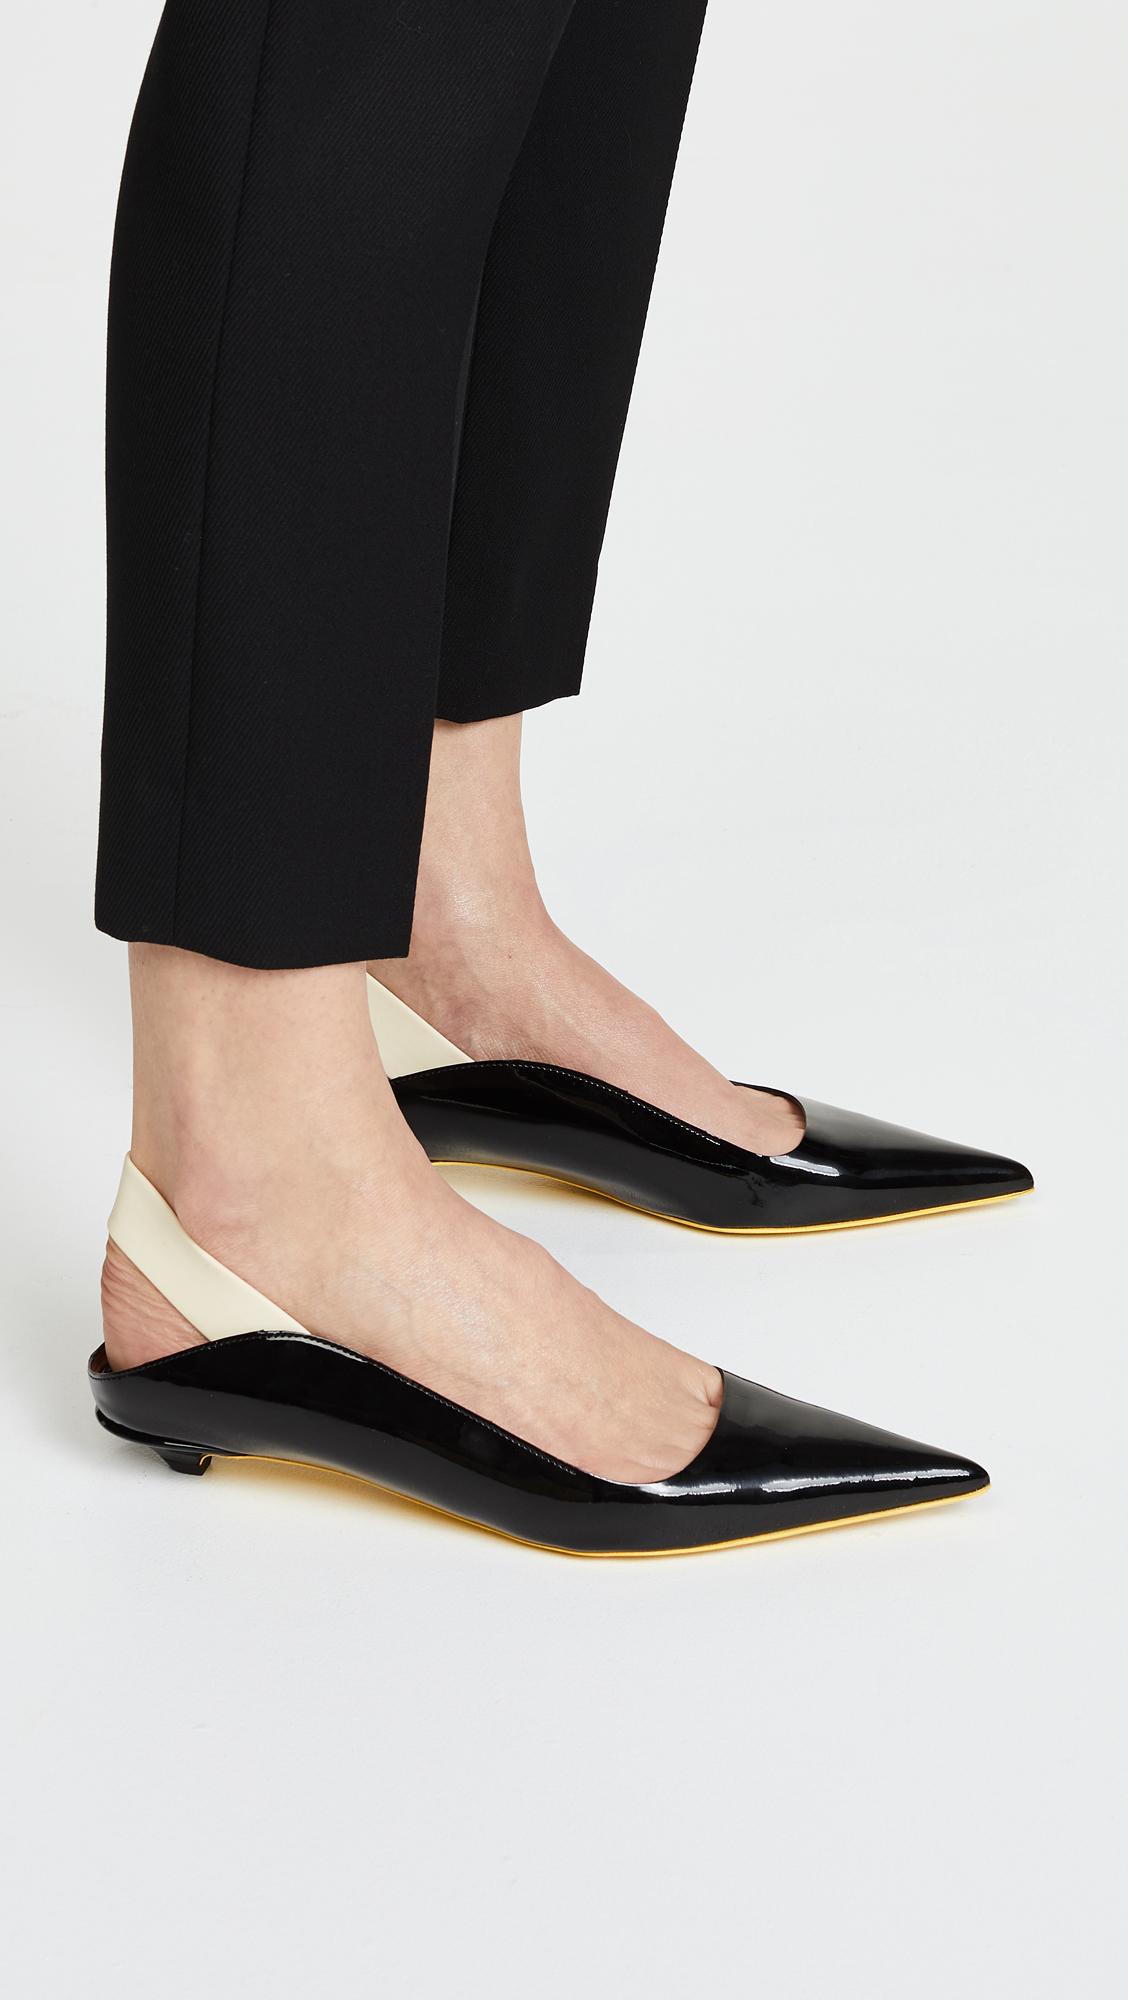 63c5275183 Proenza Schouler Rubber Strap Patent Kitten Heel Flats | SHOPBOP